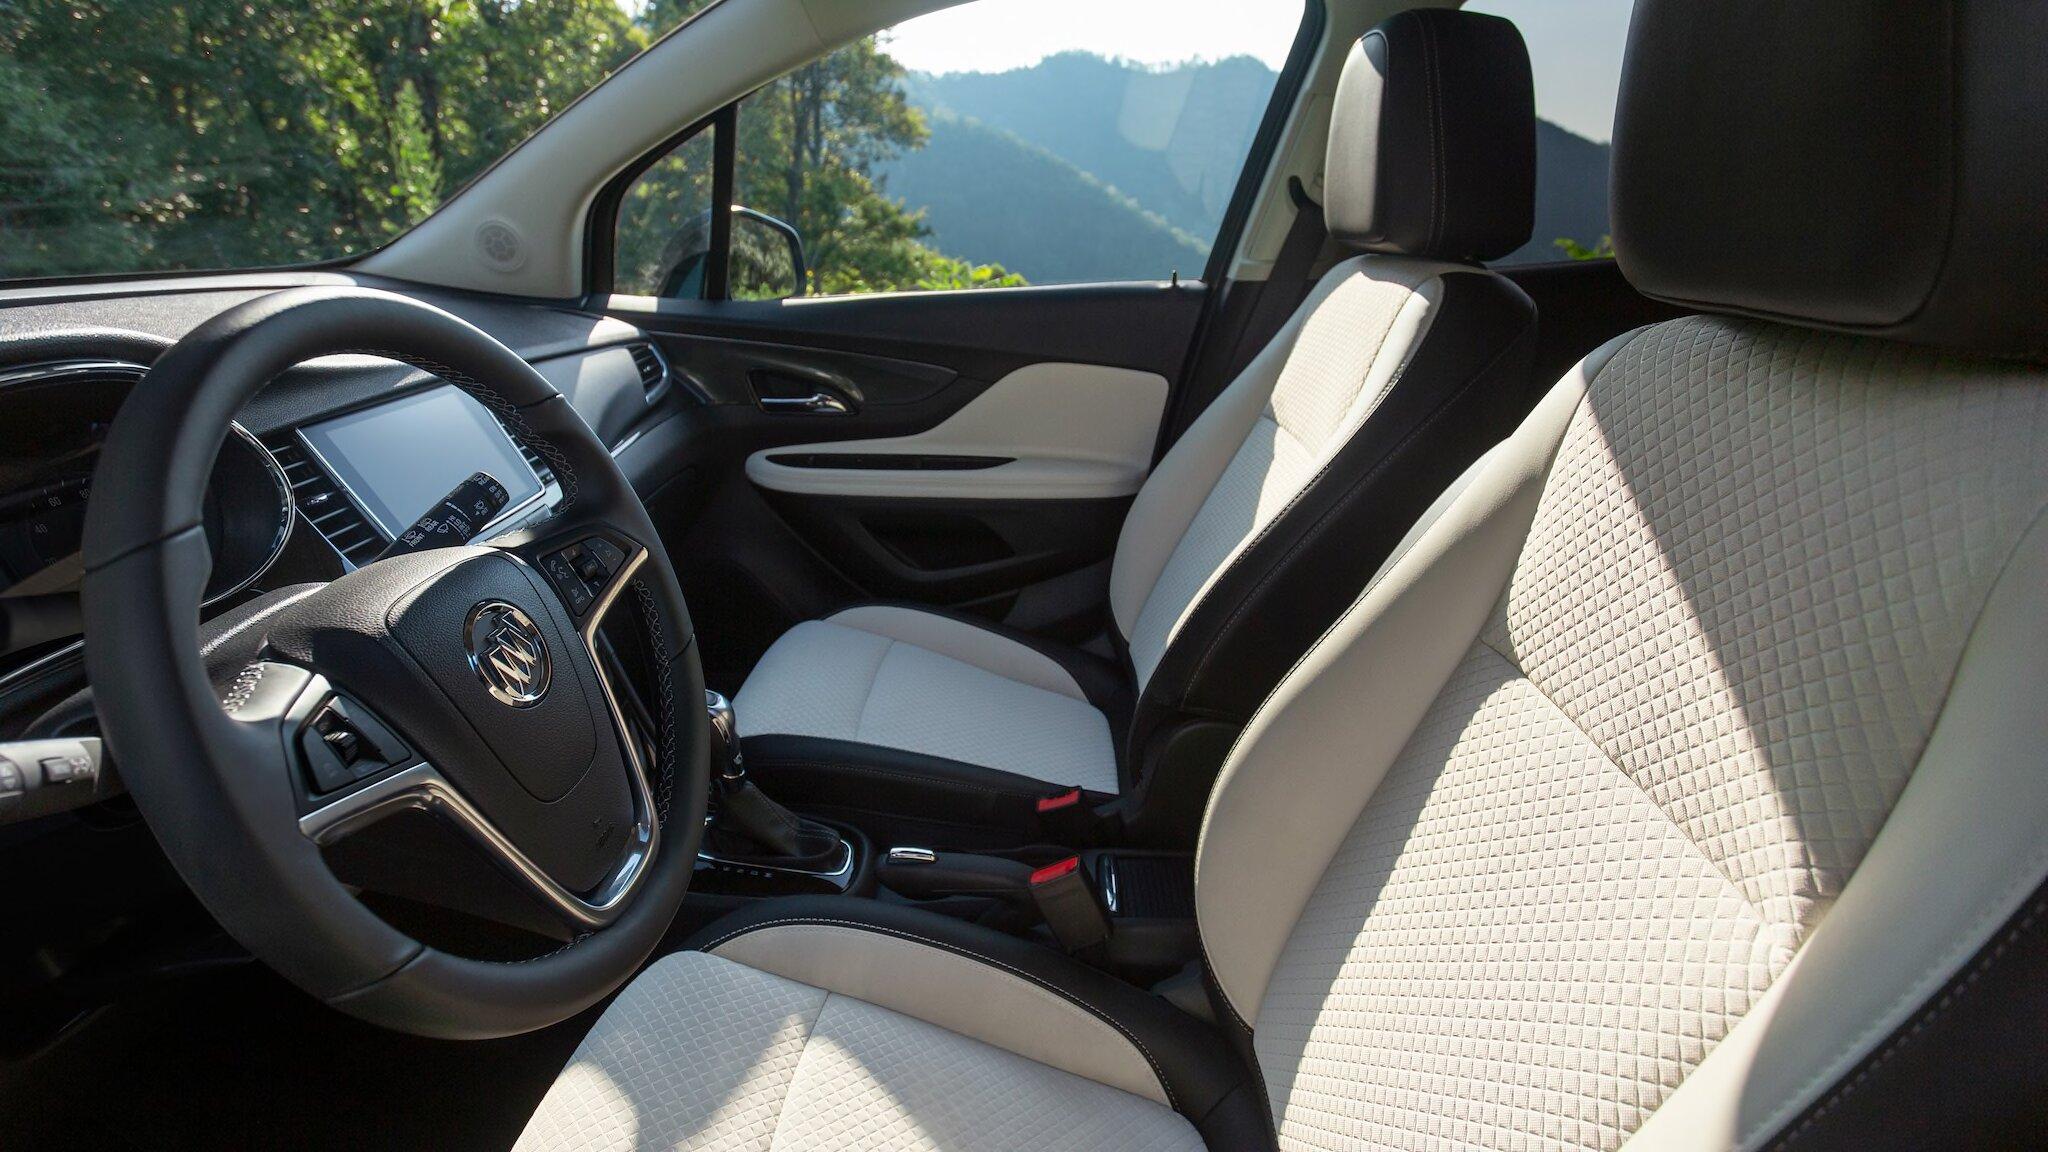 2020 Buick Encore Interior